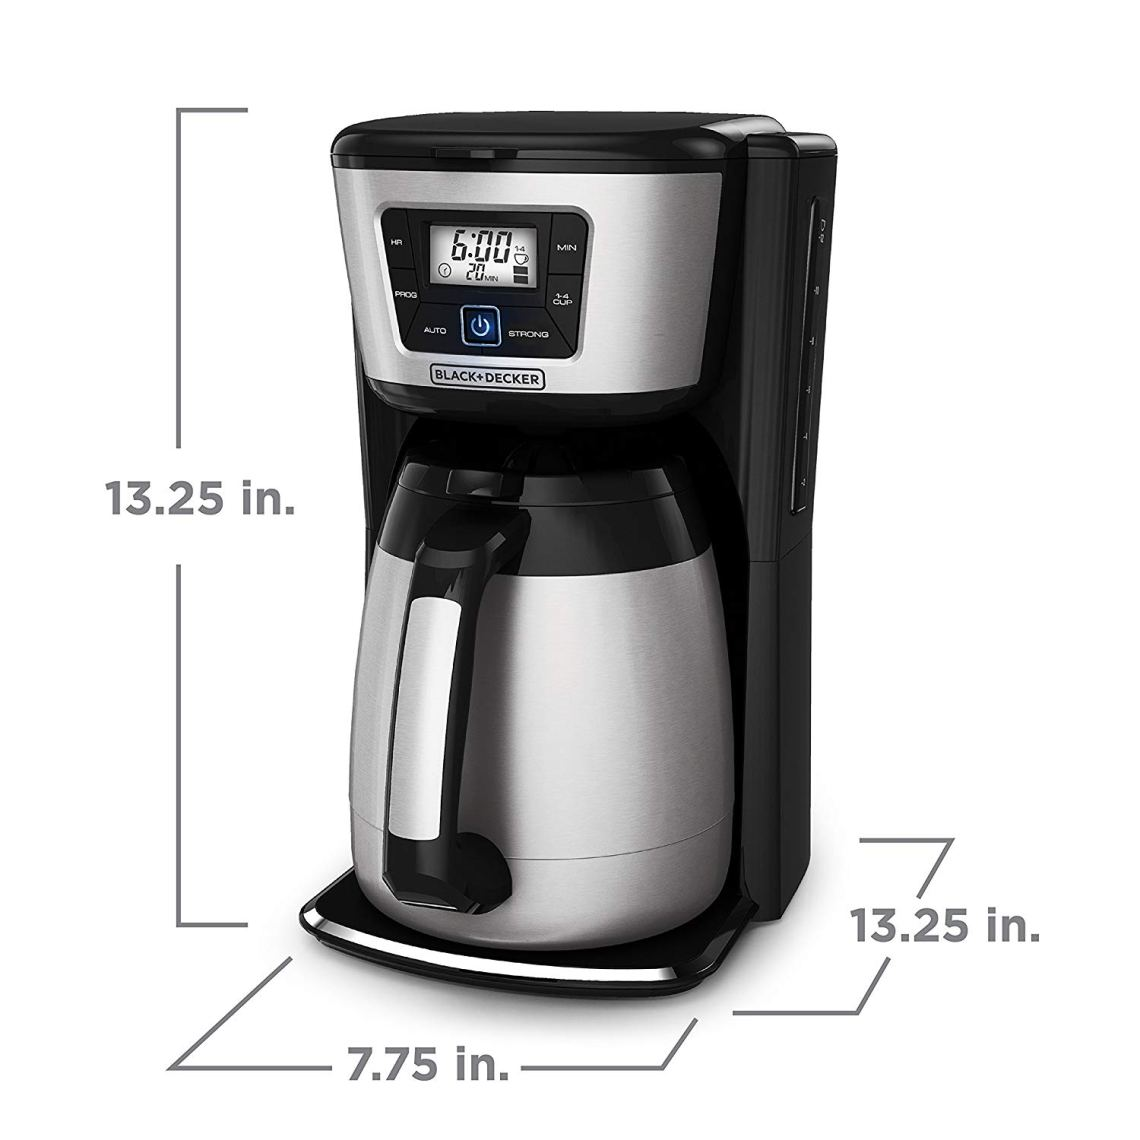 Black-Decker-Coffee-Maker-Info-Graphics